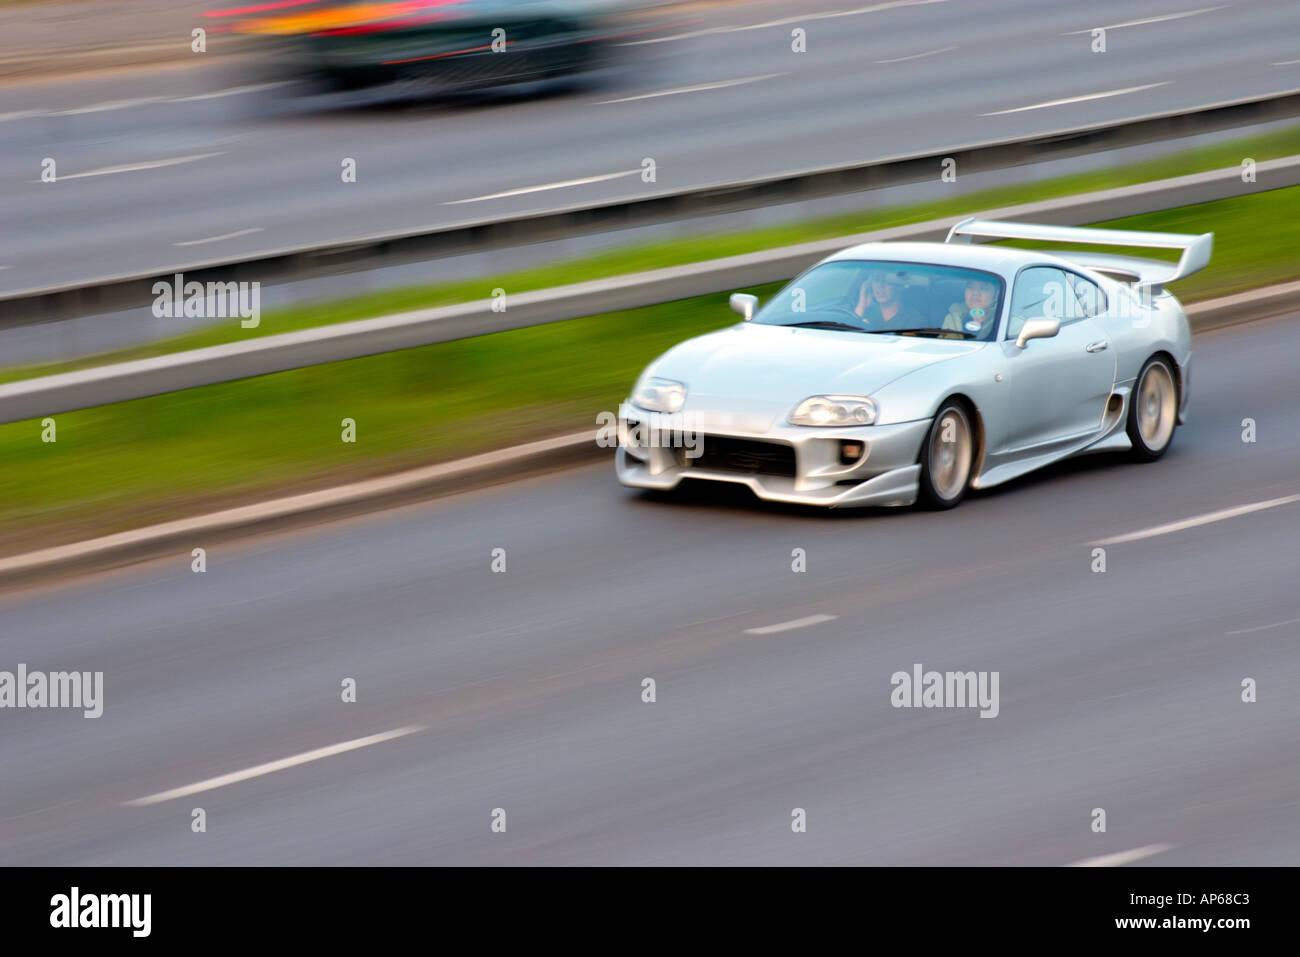 Toyota Supra Sports Car Speeding Fast On Motorway Highway Automobile